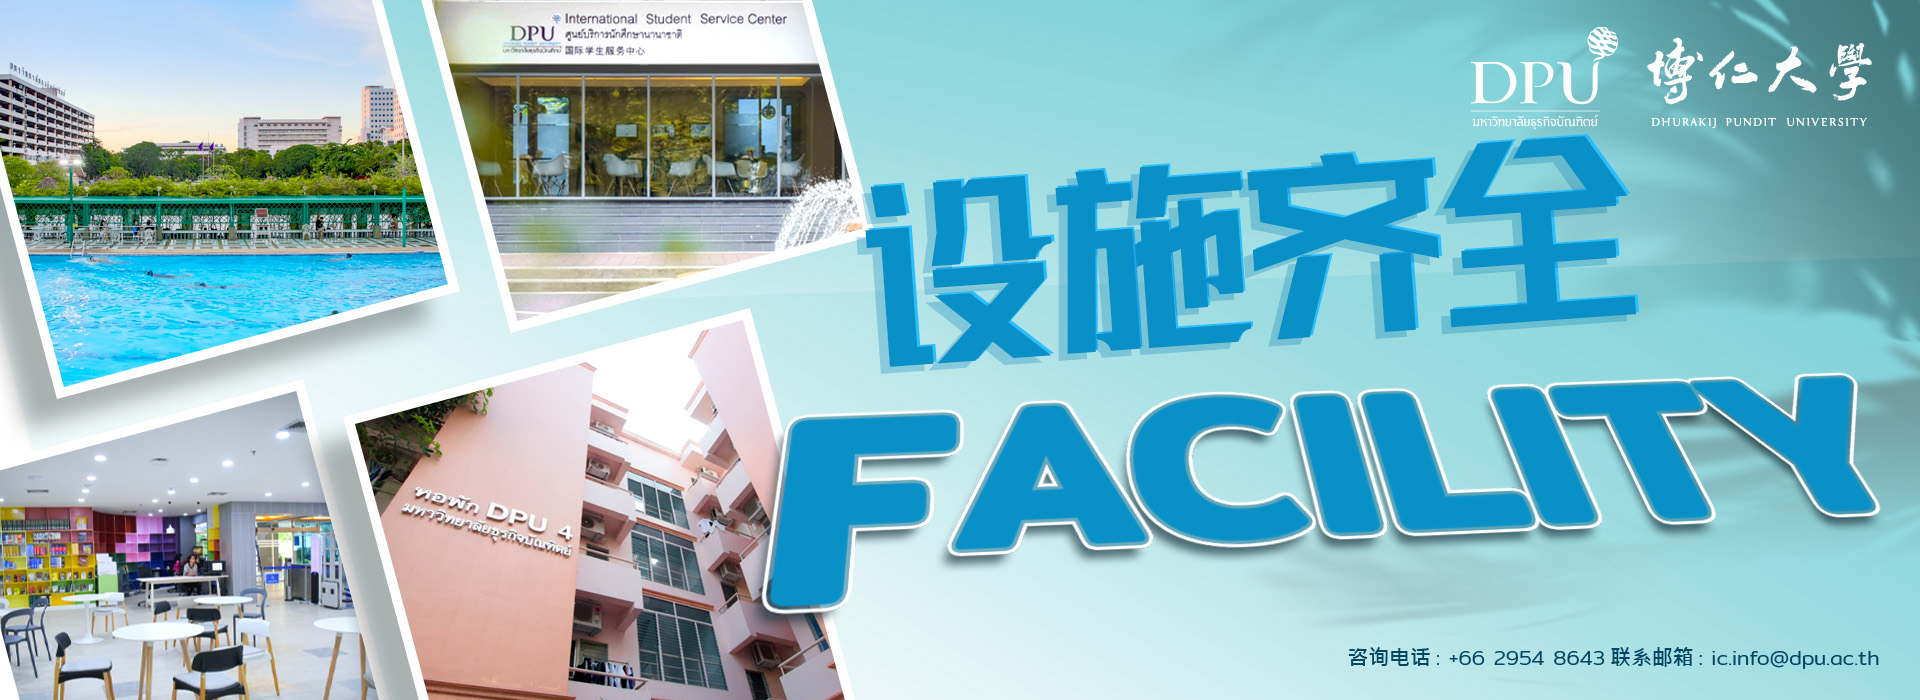 Facility_Chinese